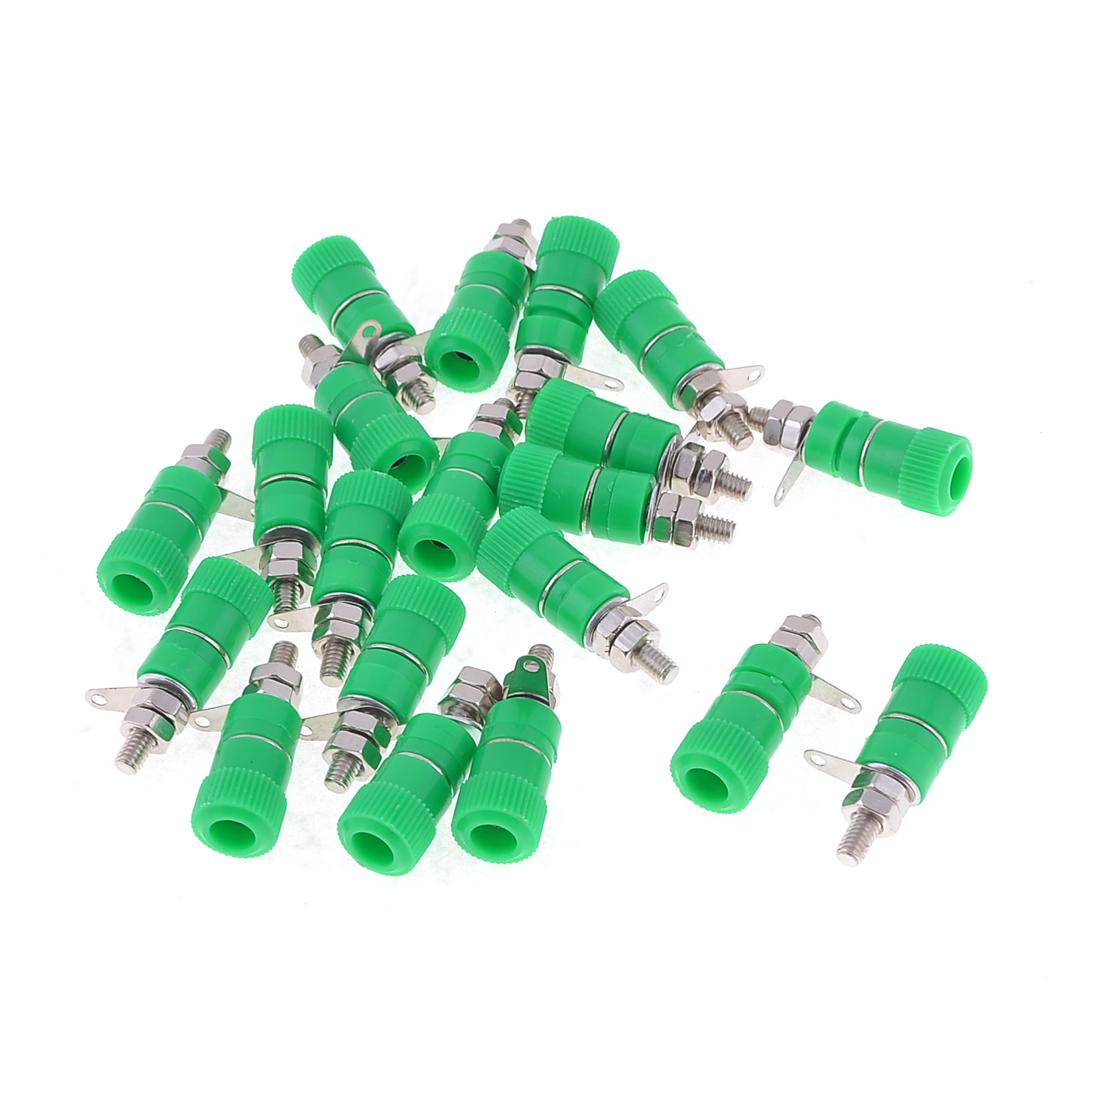 20 Pcs Green Plastic Shell Metal Body 3mm Dia Thread Banana Binding Post